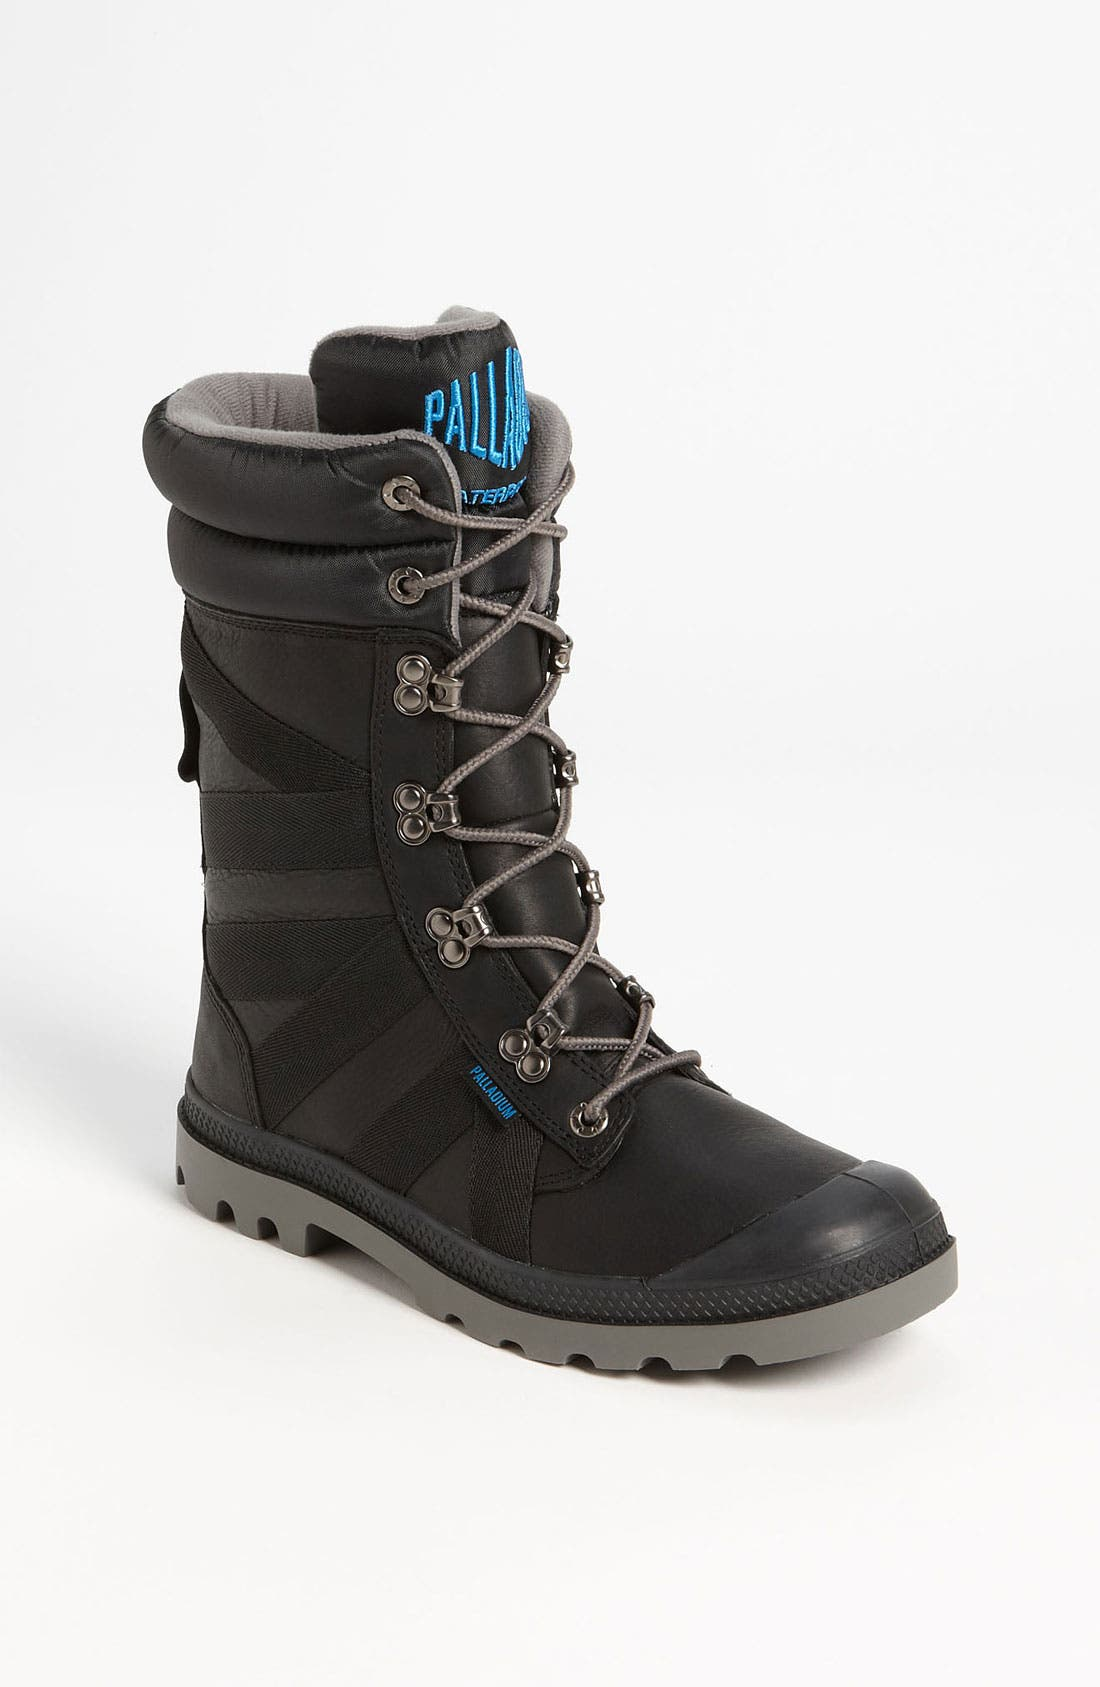 Alternate Image 1 Selected - Palladium 'Pampa' Snow Boot